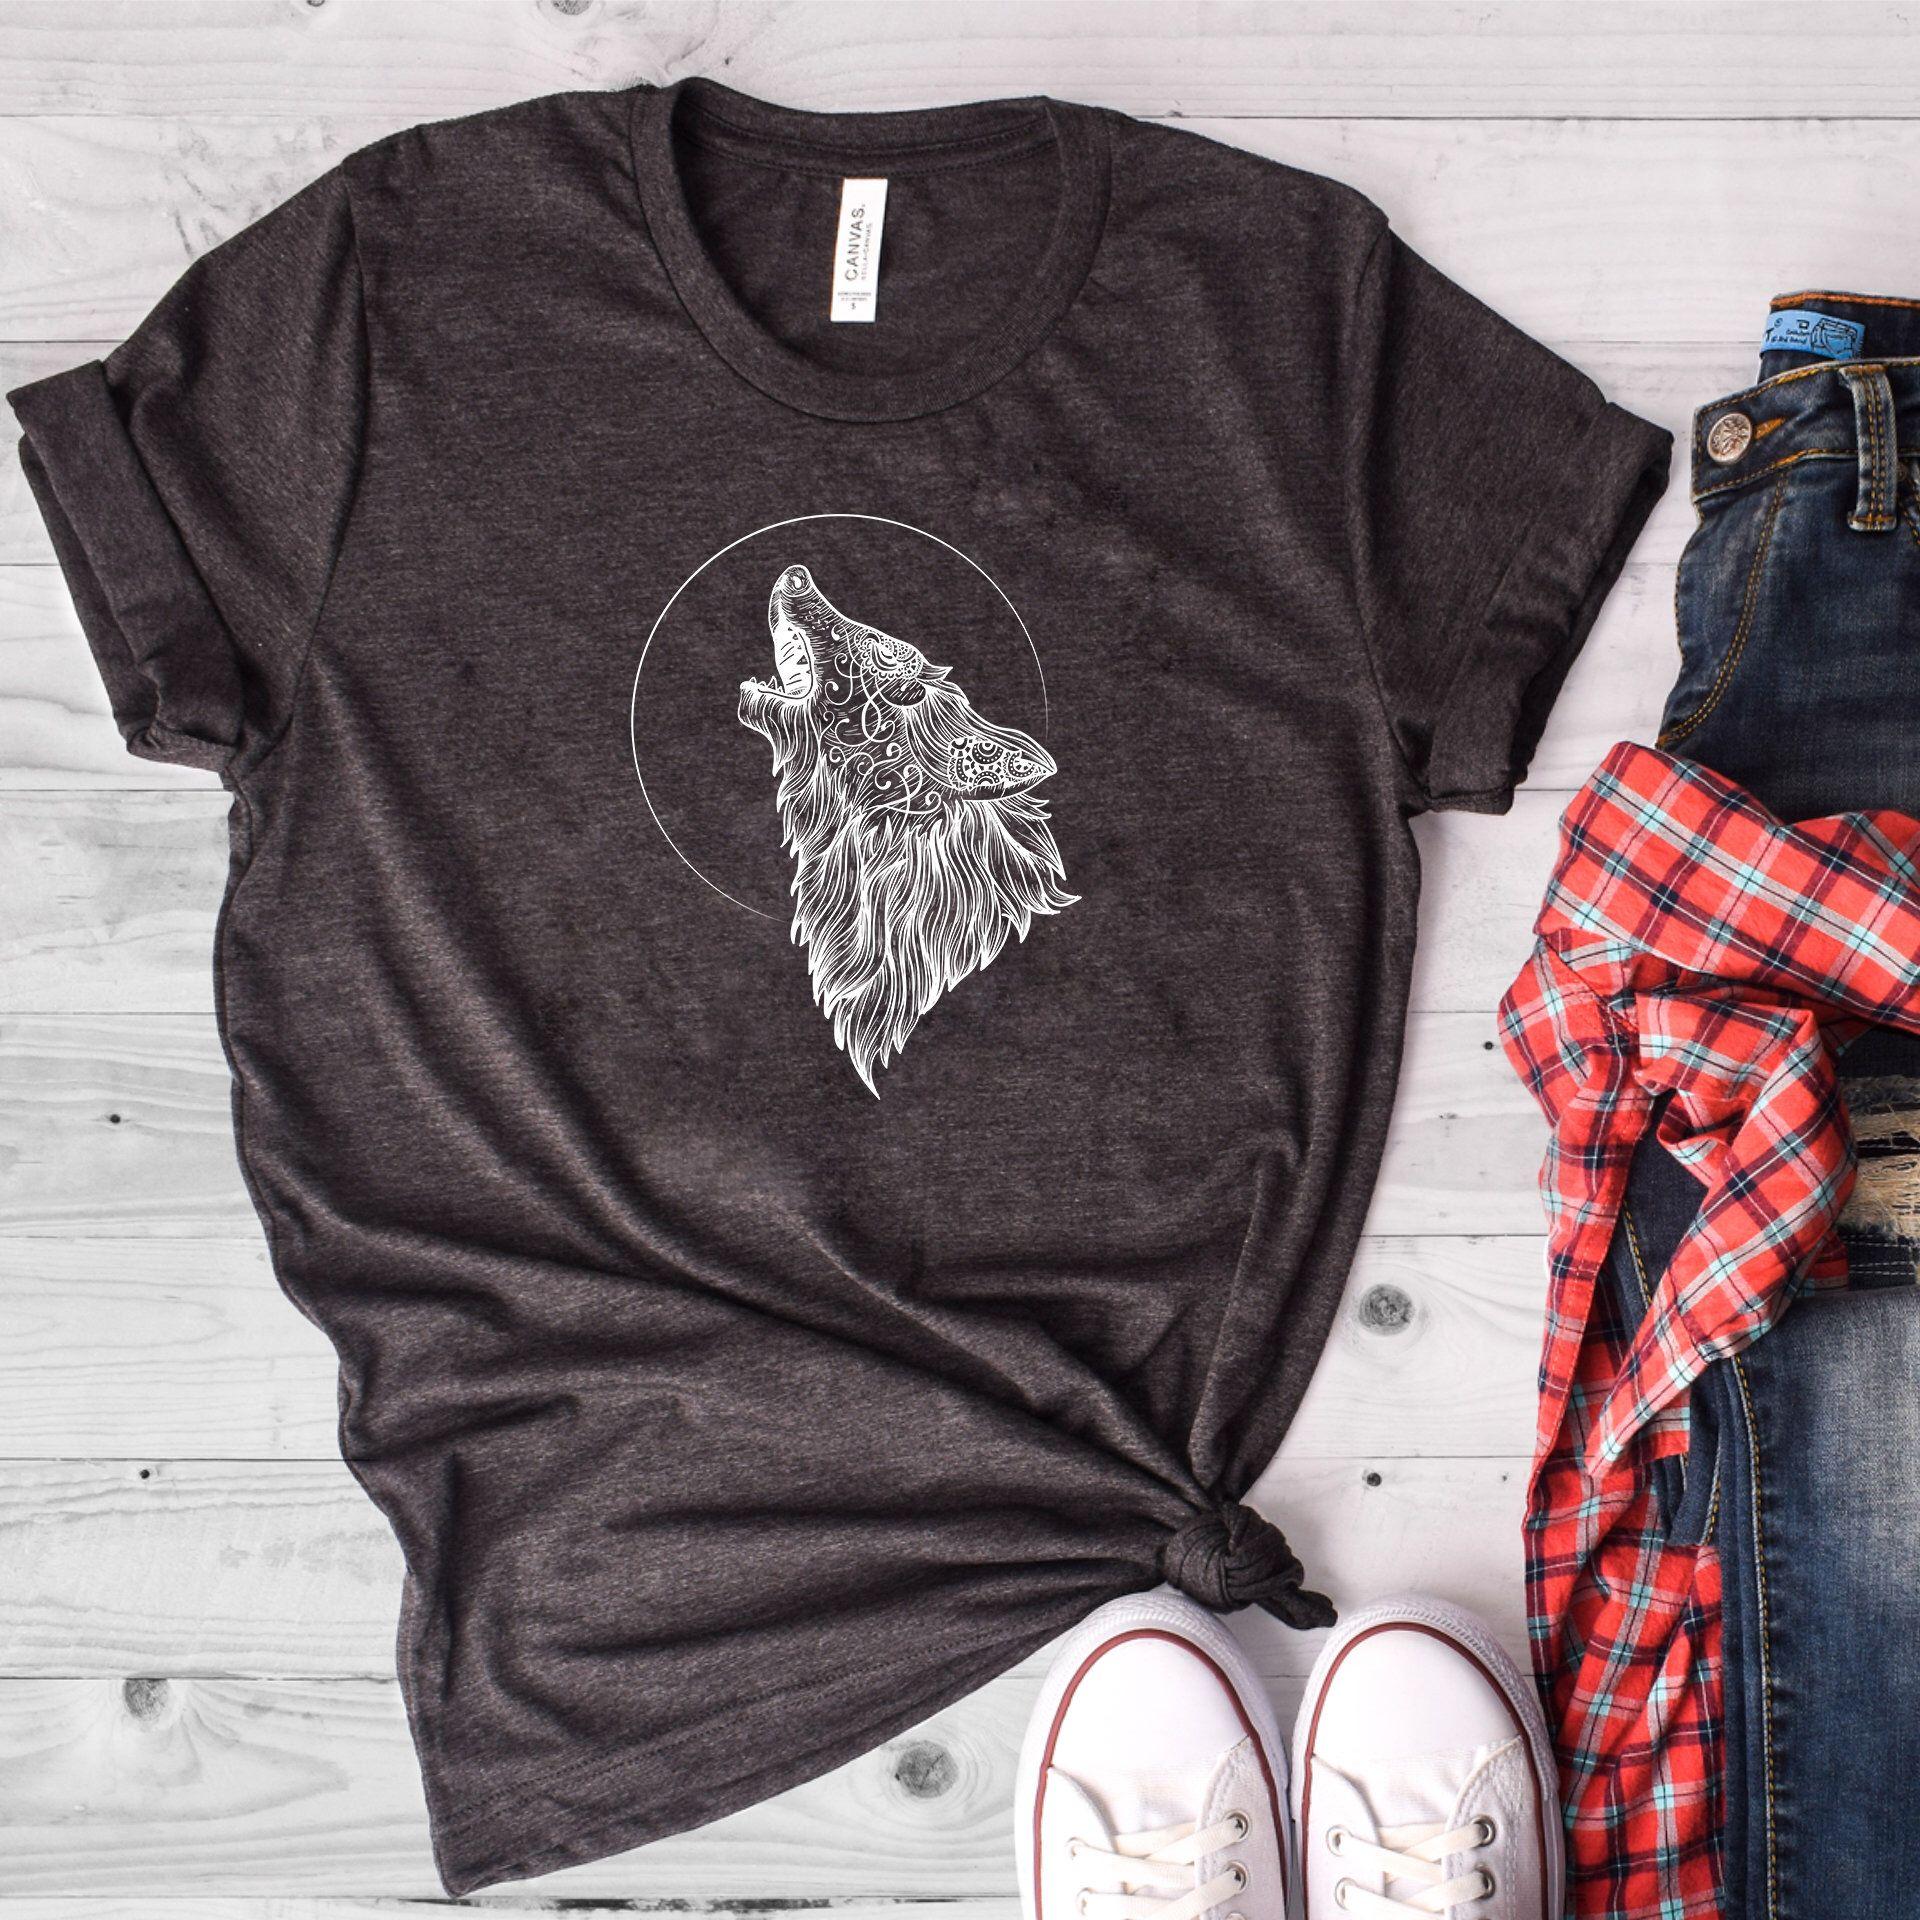 Wolf Howling Shirt Wolf Shirt Howling Wolf Shirt Wolves Etsy Shirts Moon Shirt Wolf Shirt